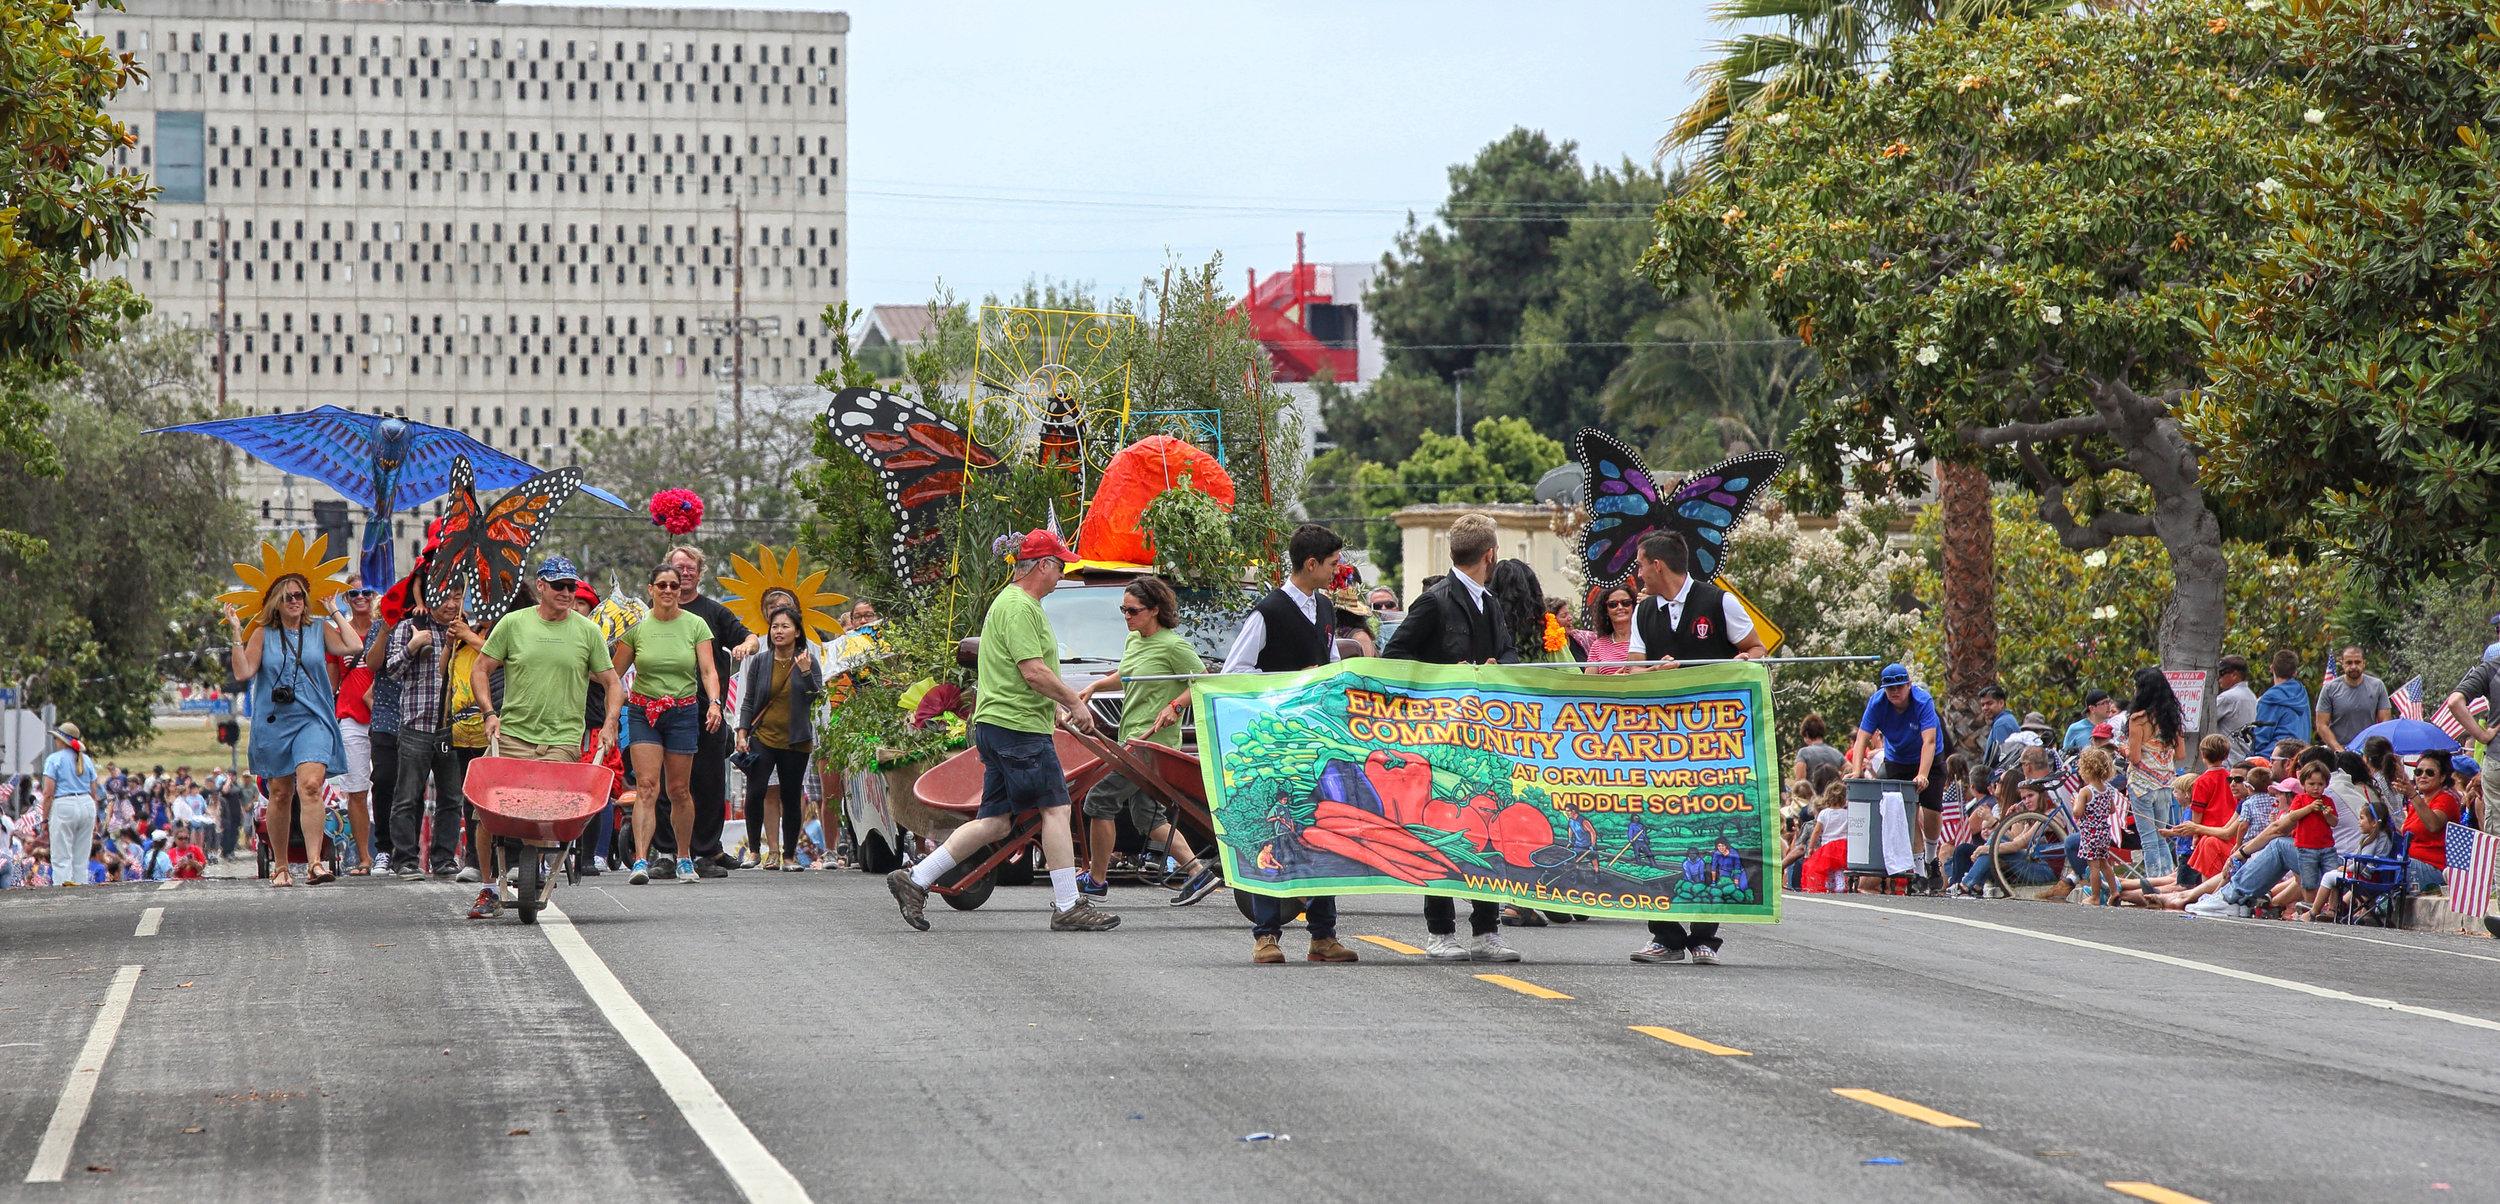 emerson avenue community garden parade 2016